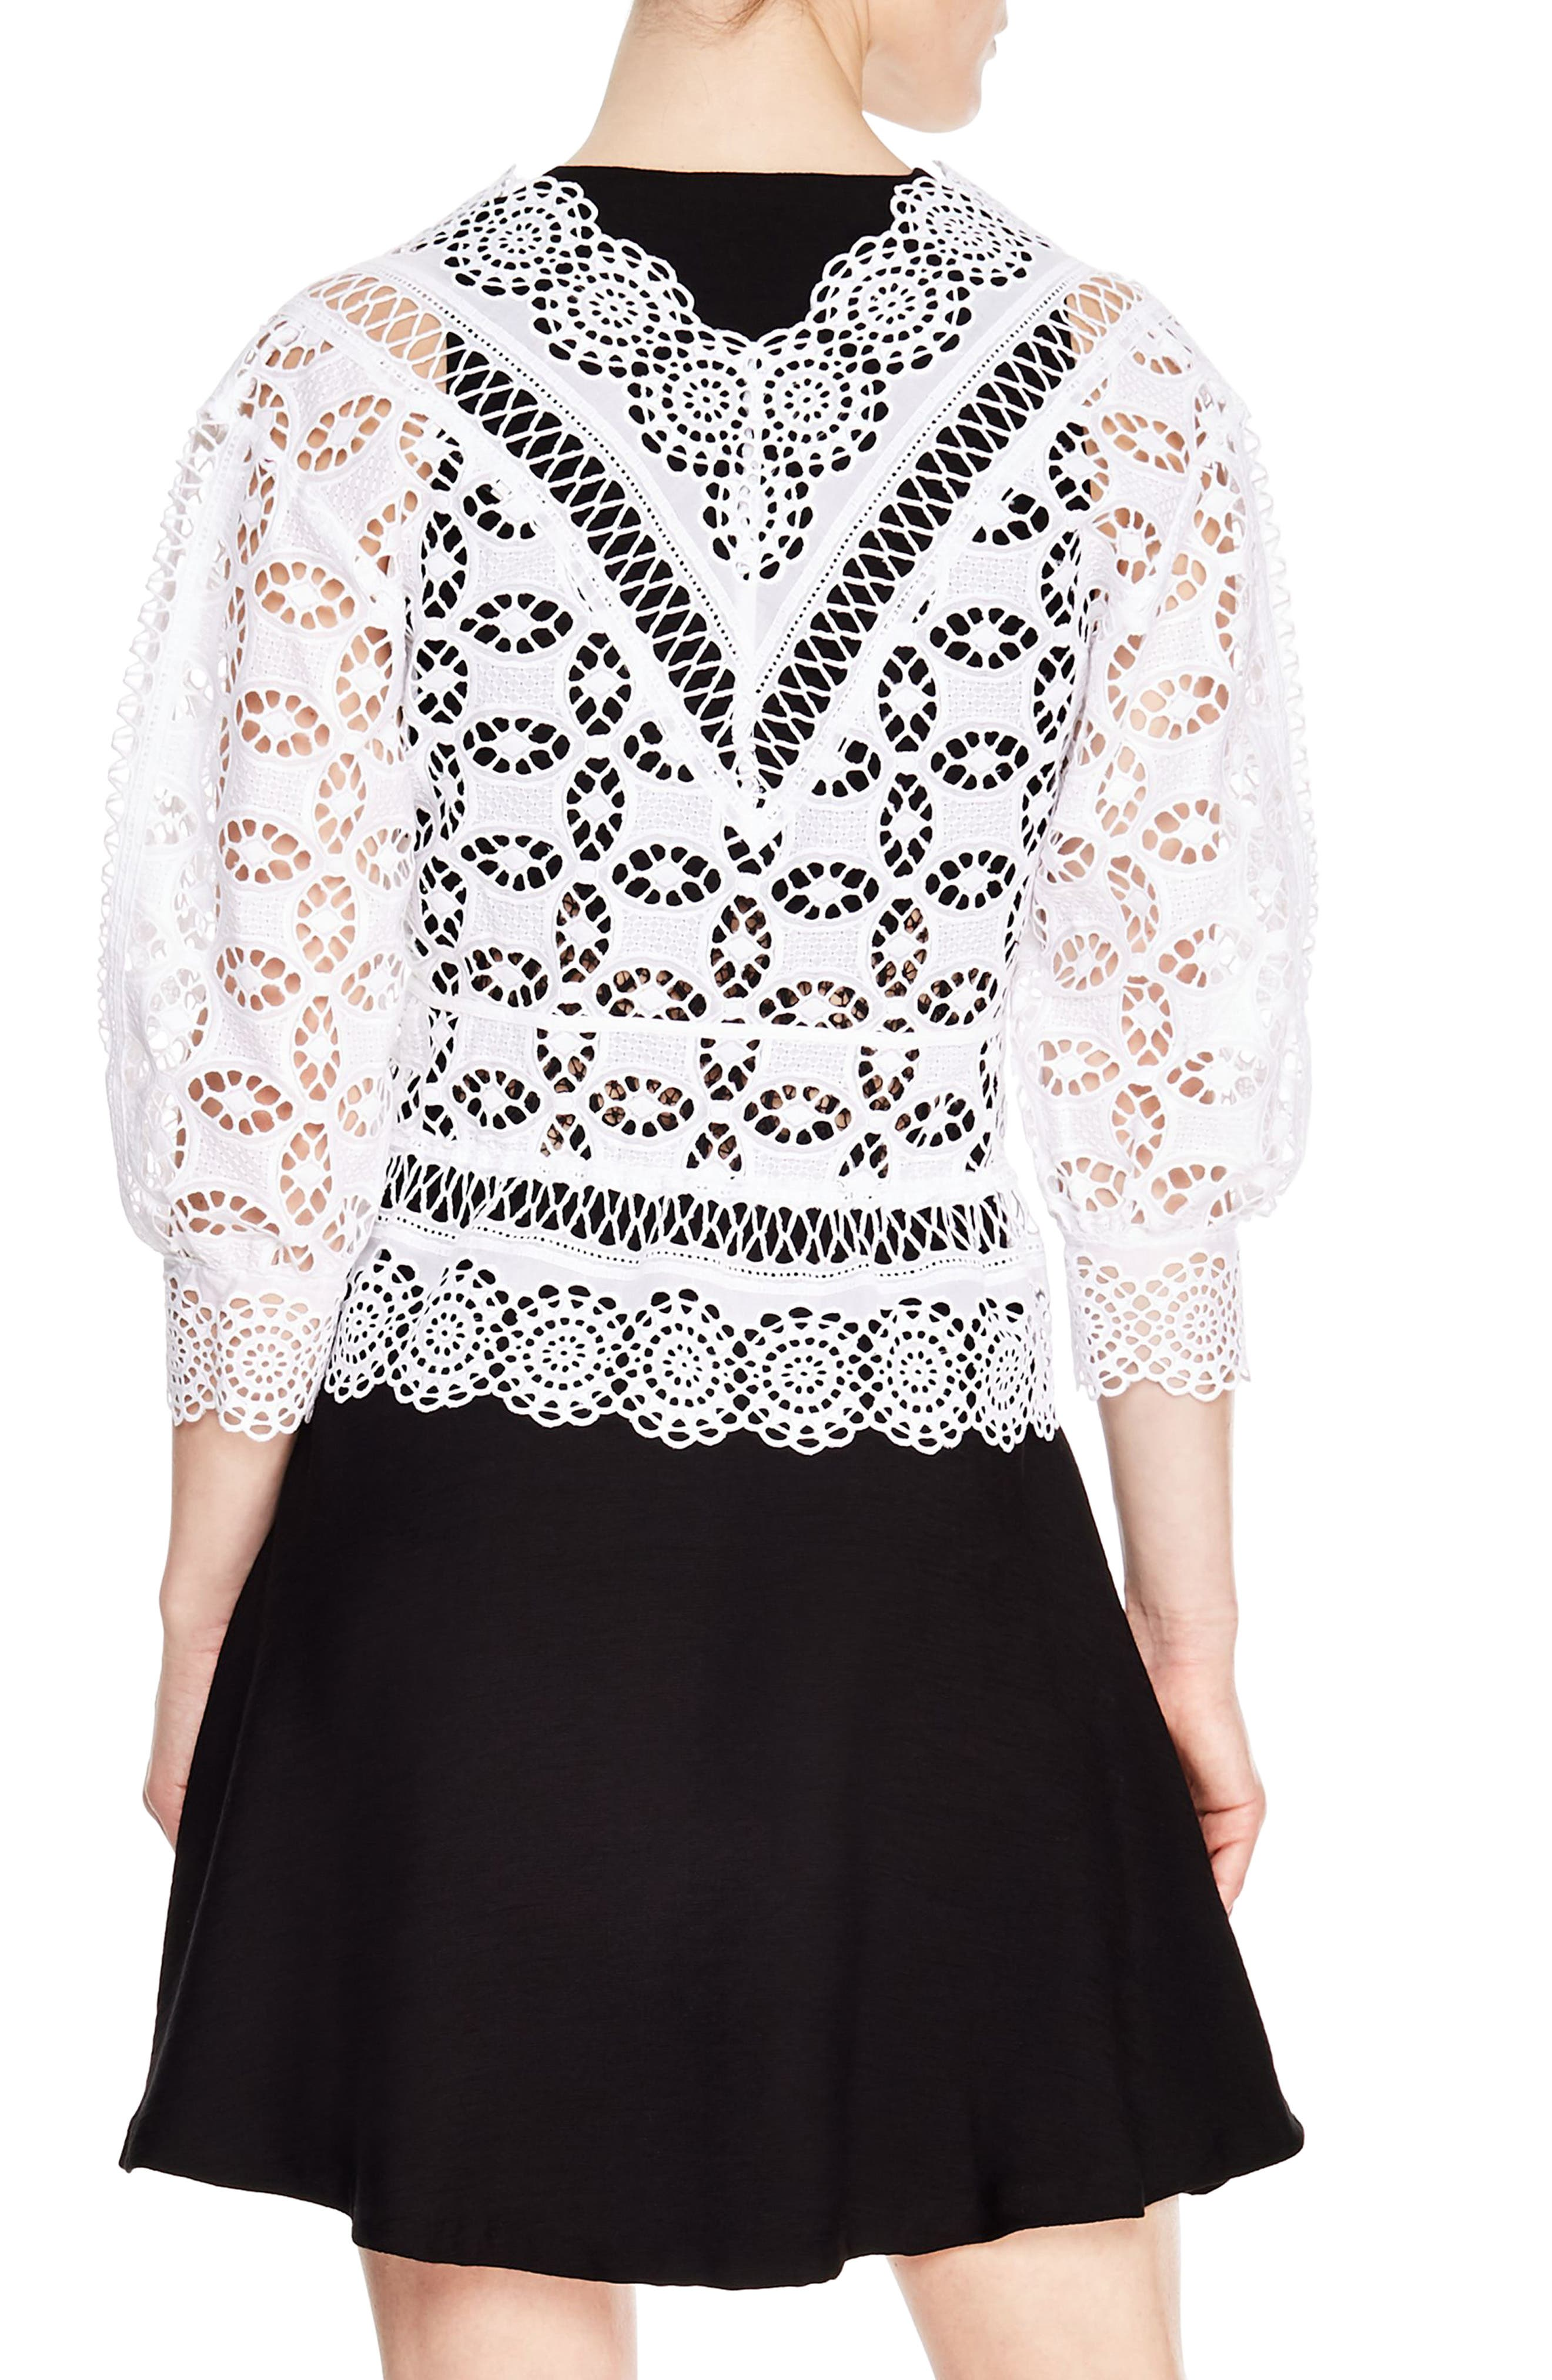 Paula Crochet Top,                             Alternate thumbnail 2, color,                             WHITE